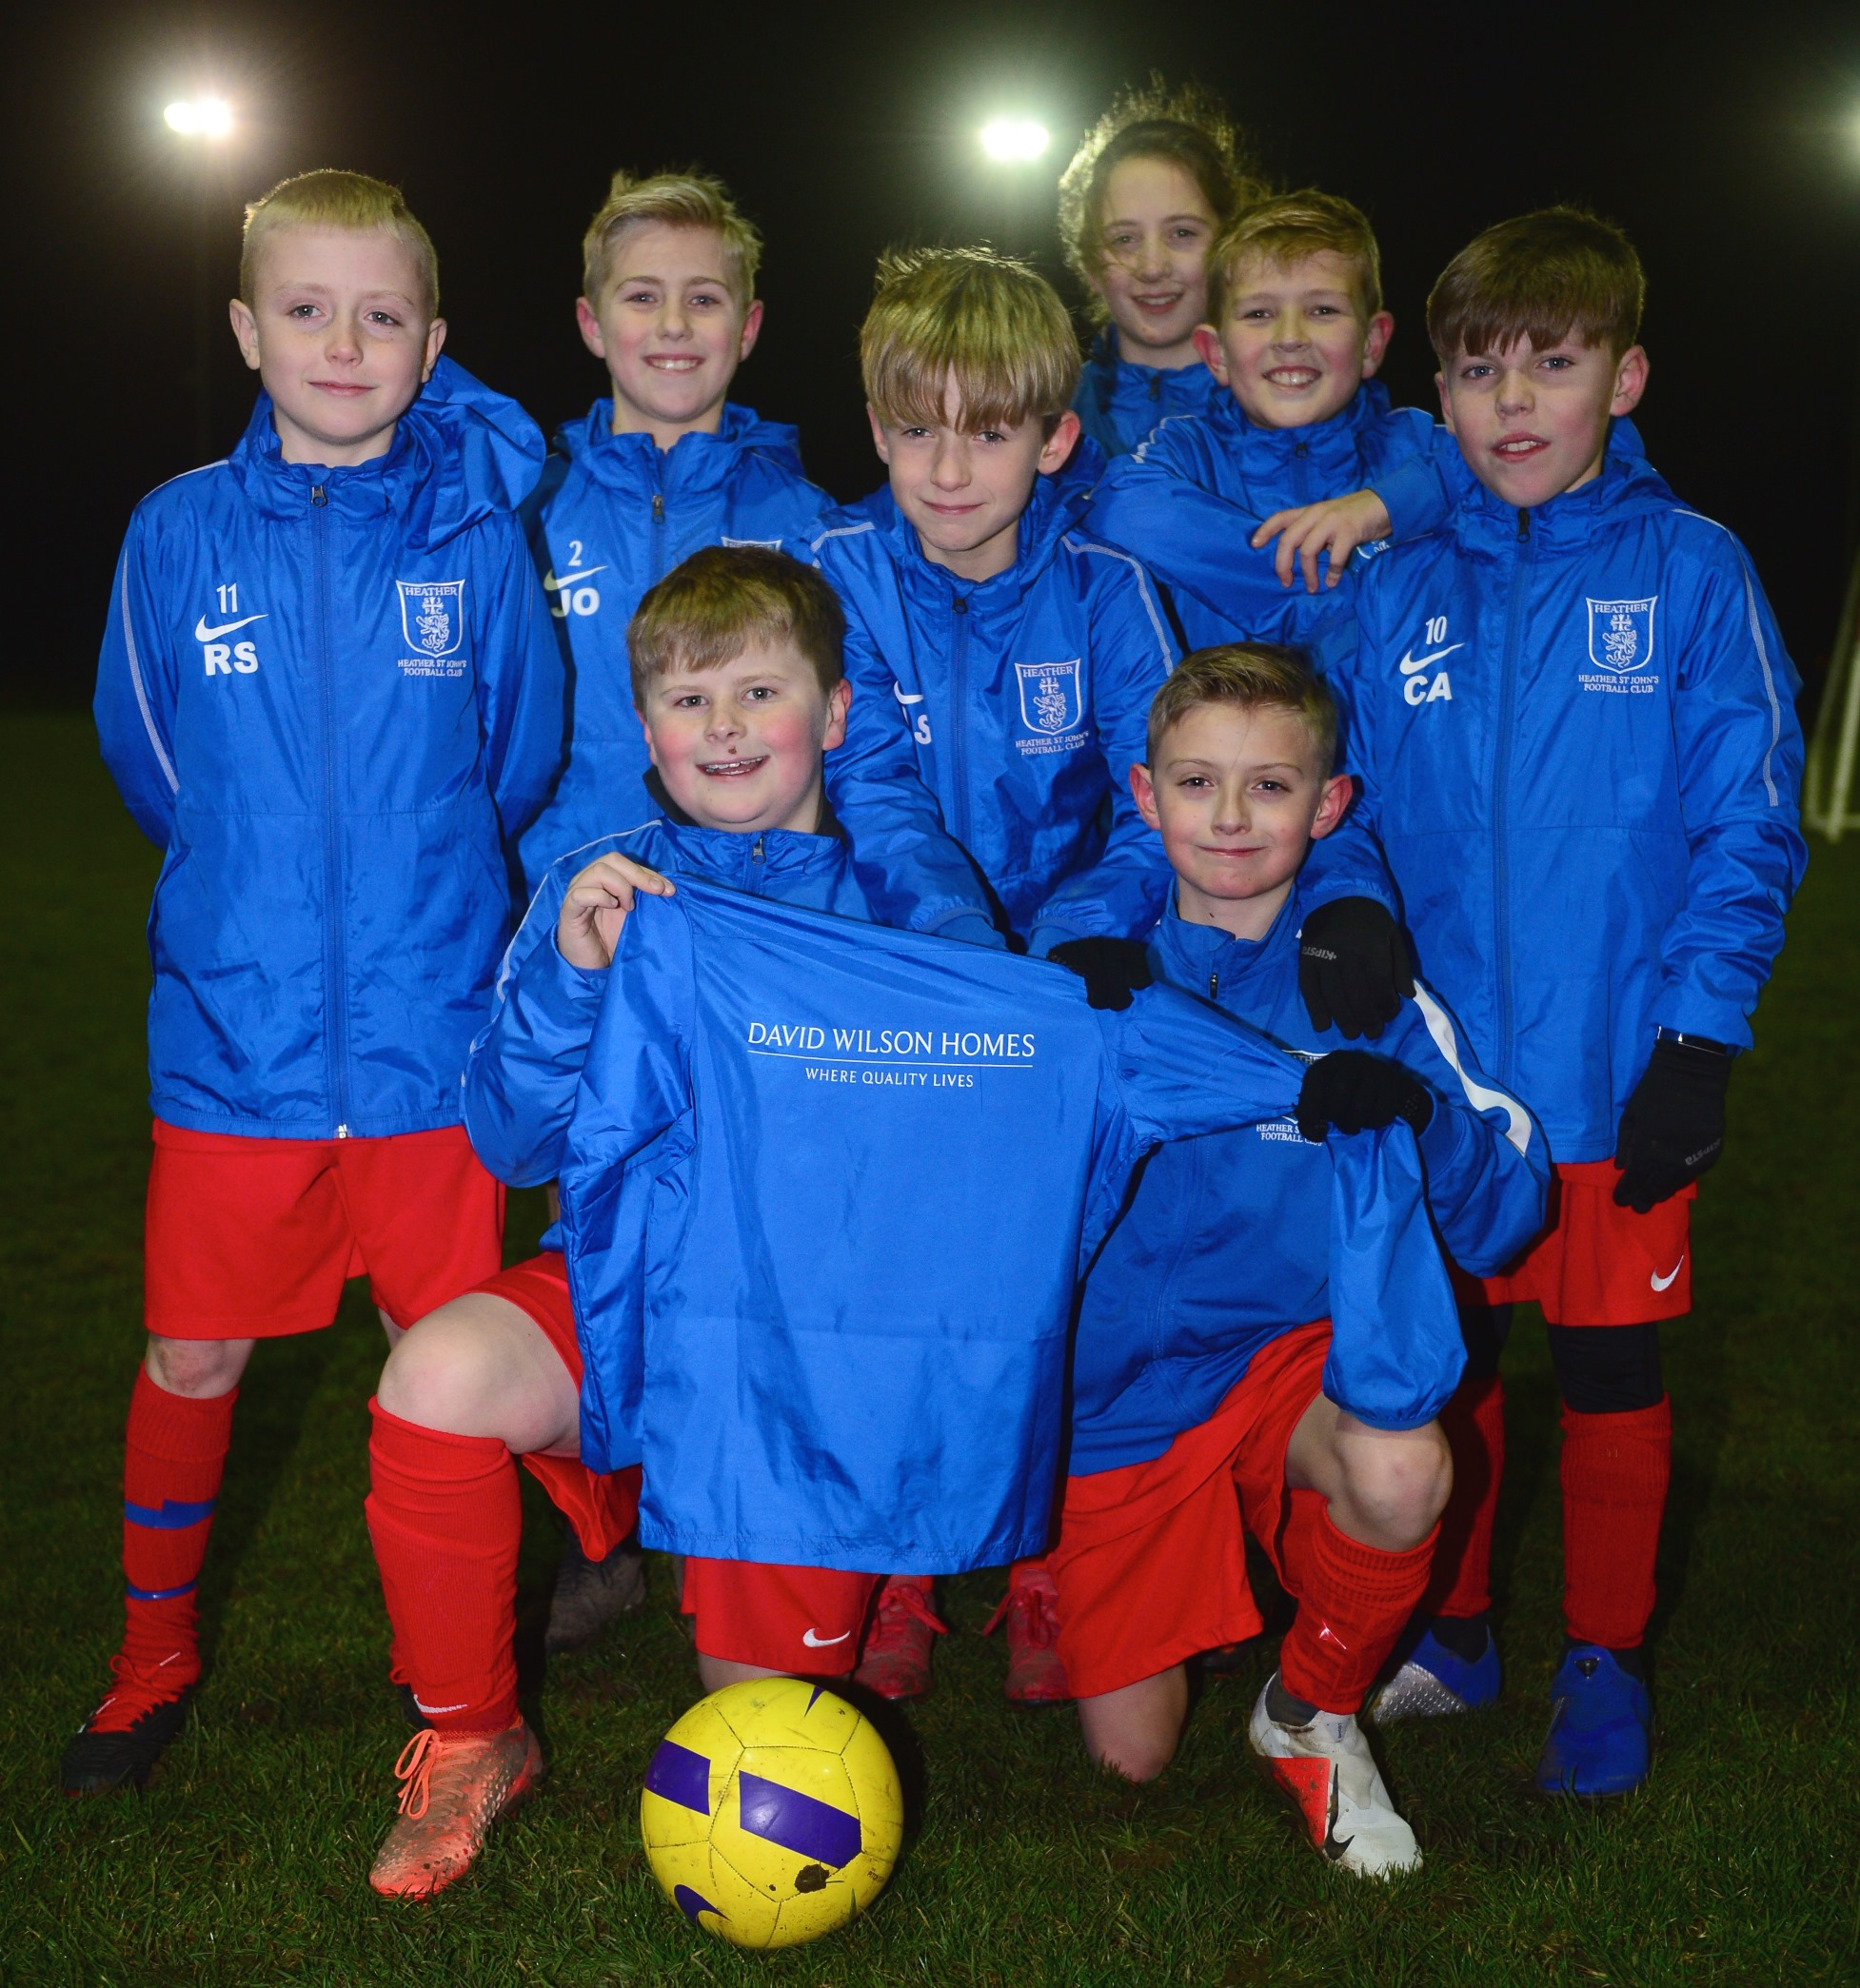 Coalville Football Team scores sponsorship with David Wilson Homes